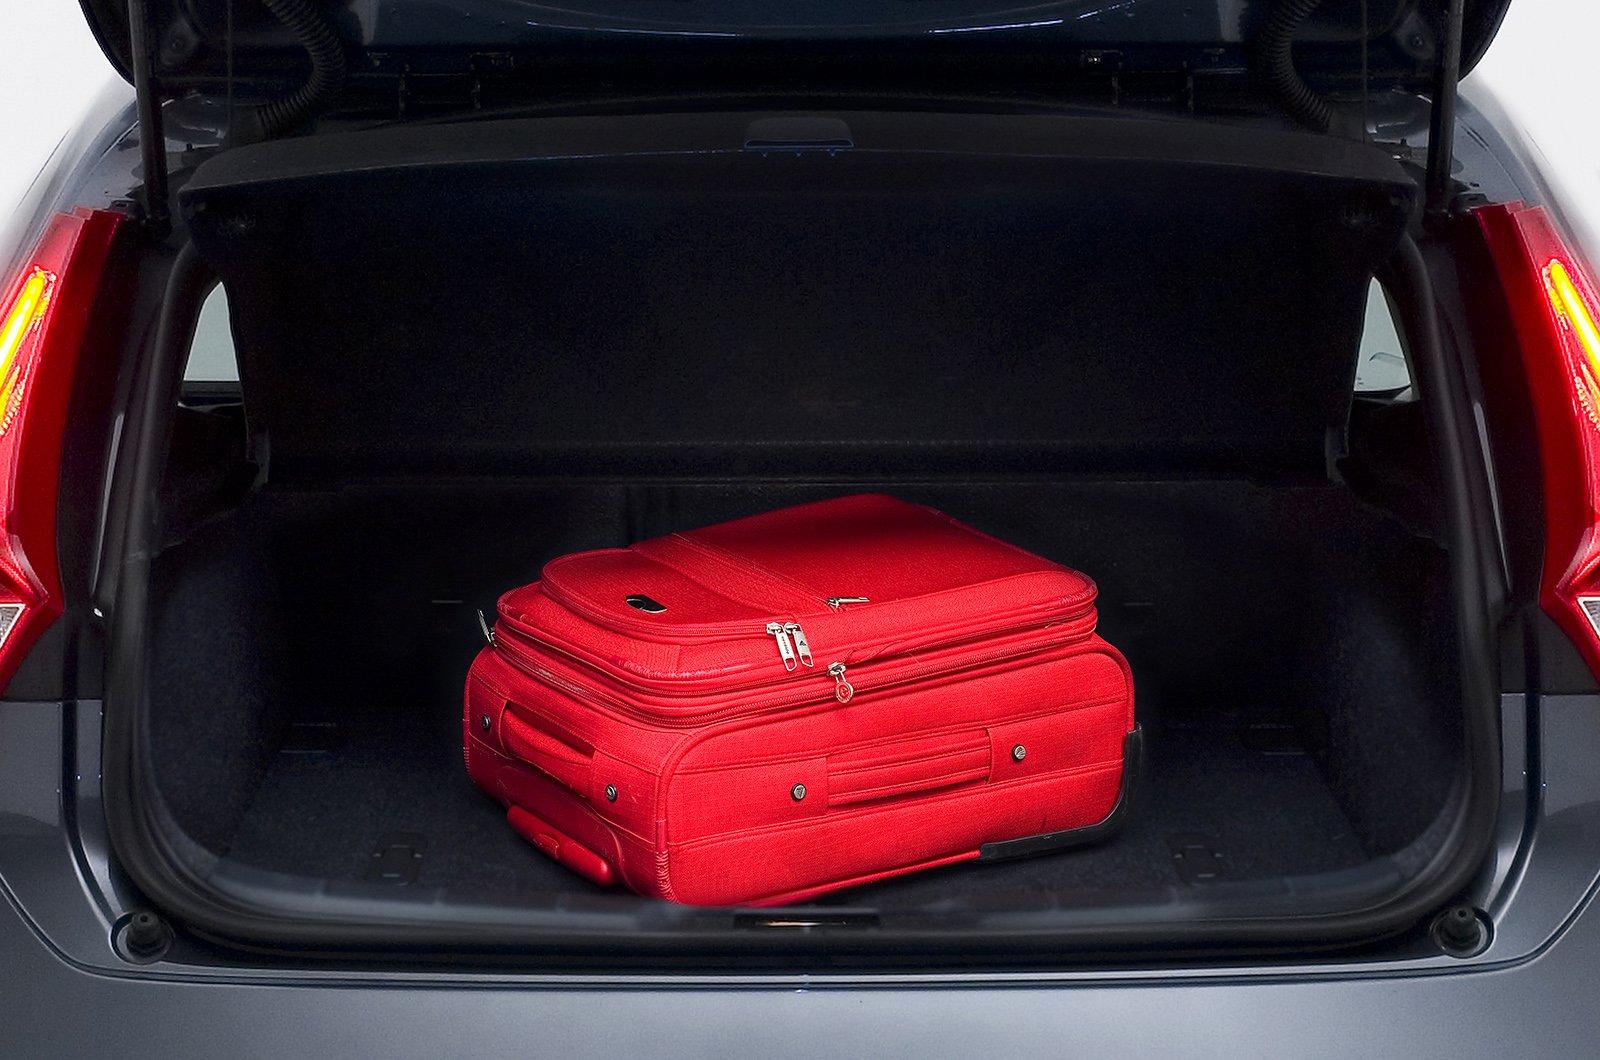 Volvo V40 2012-2019 boot